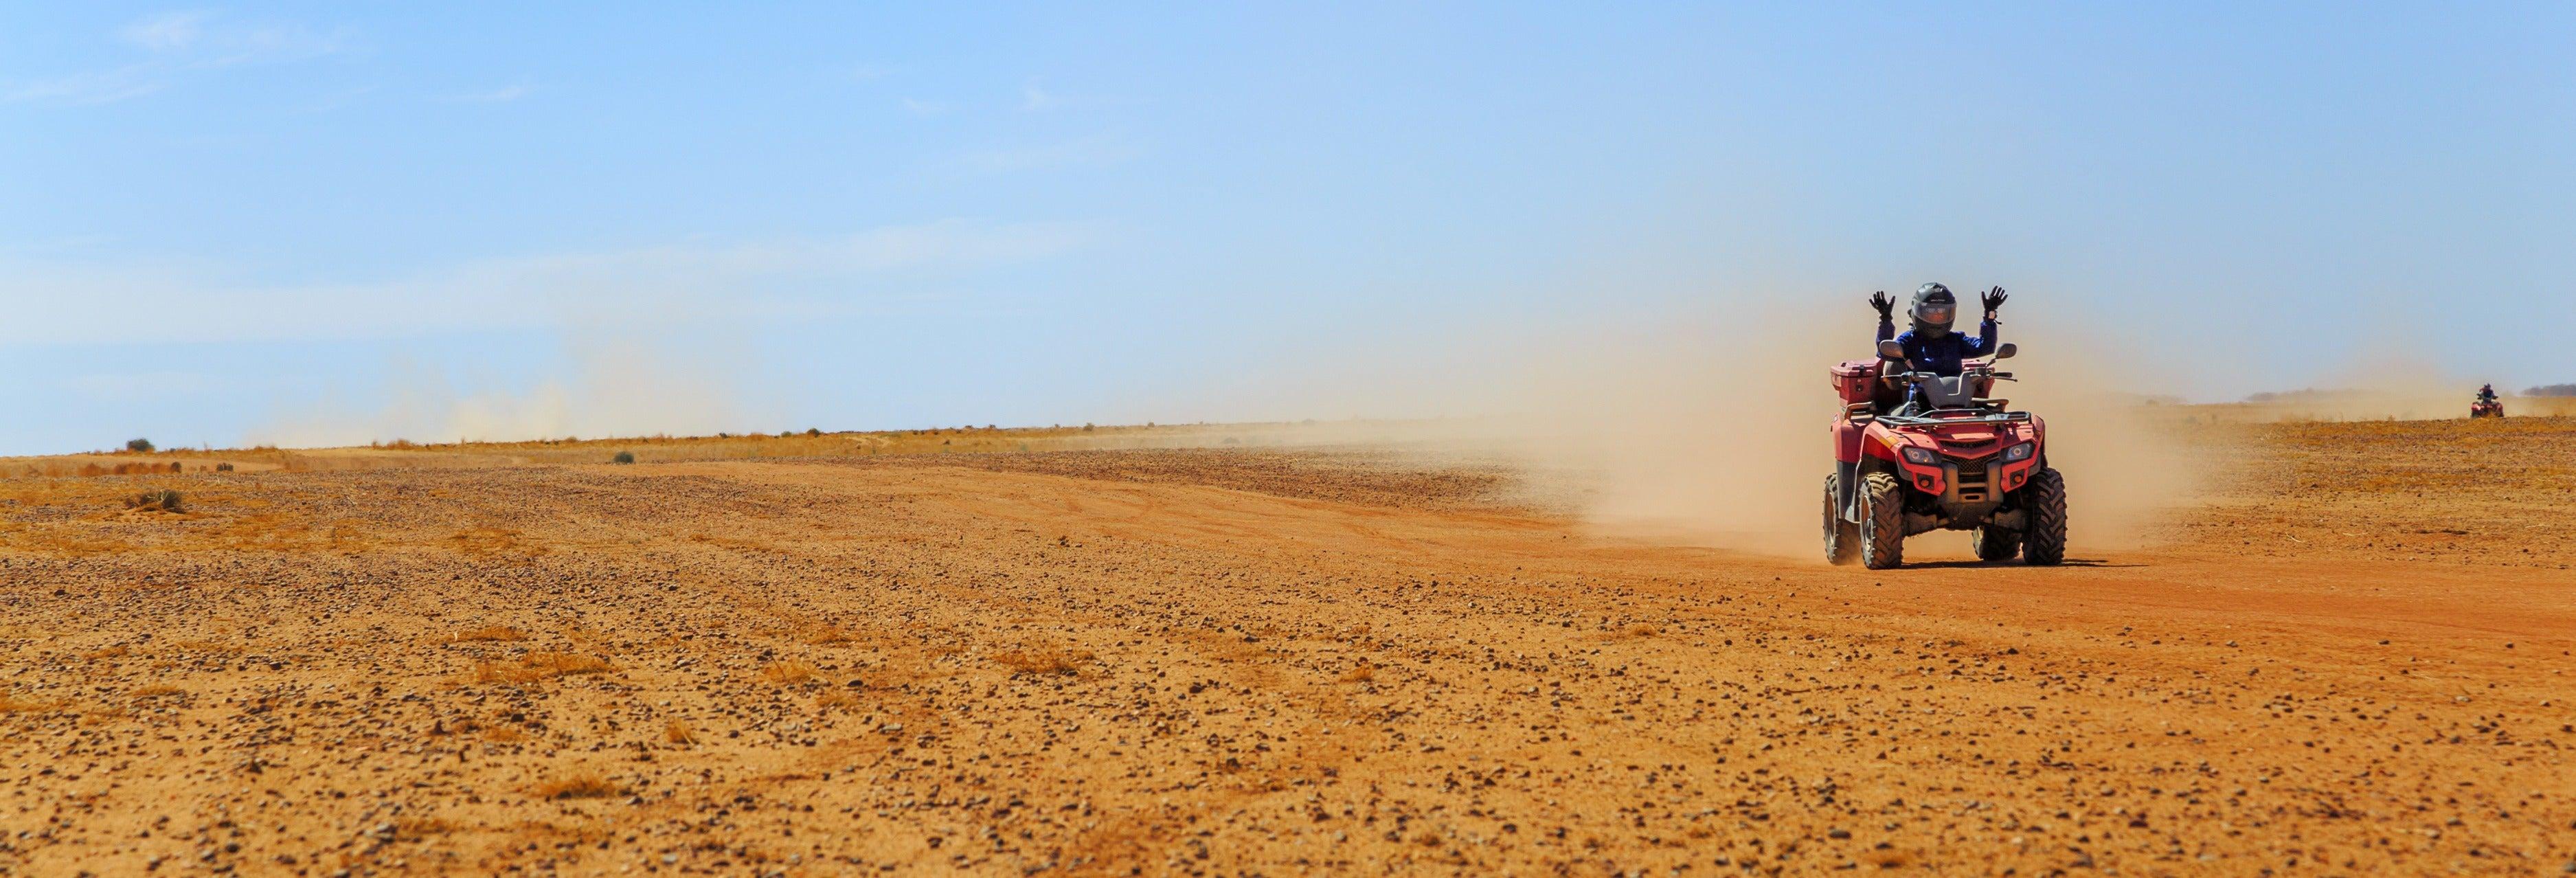 Tour de buggy + Passeio de camelo